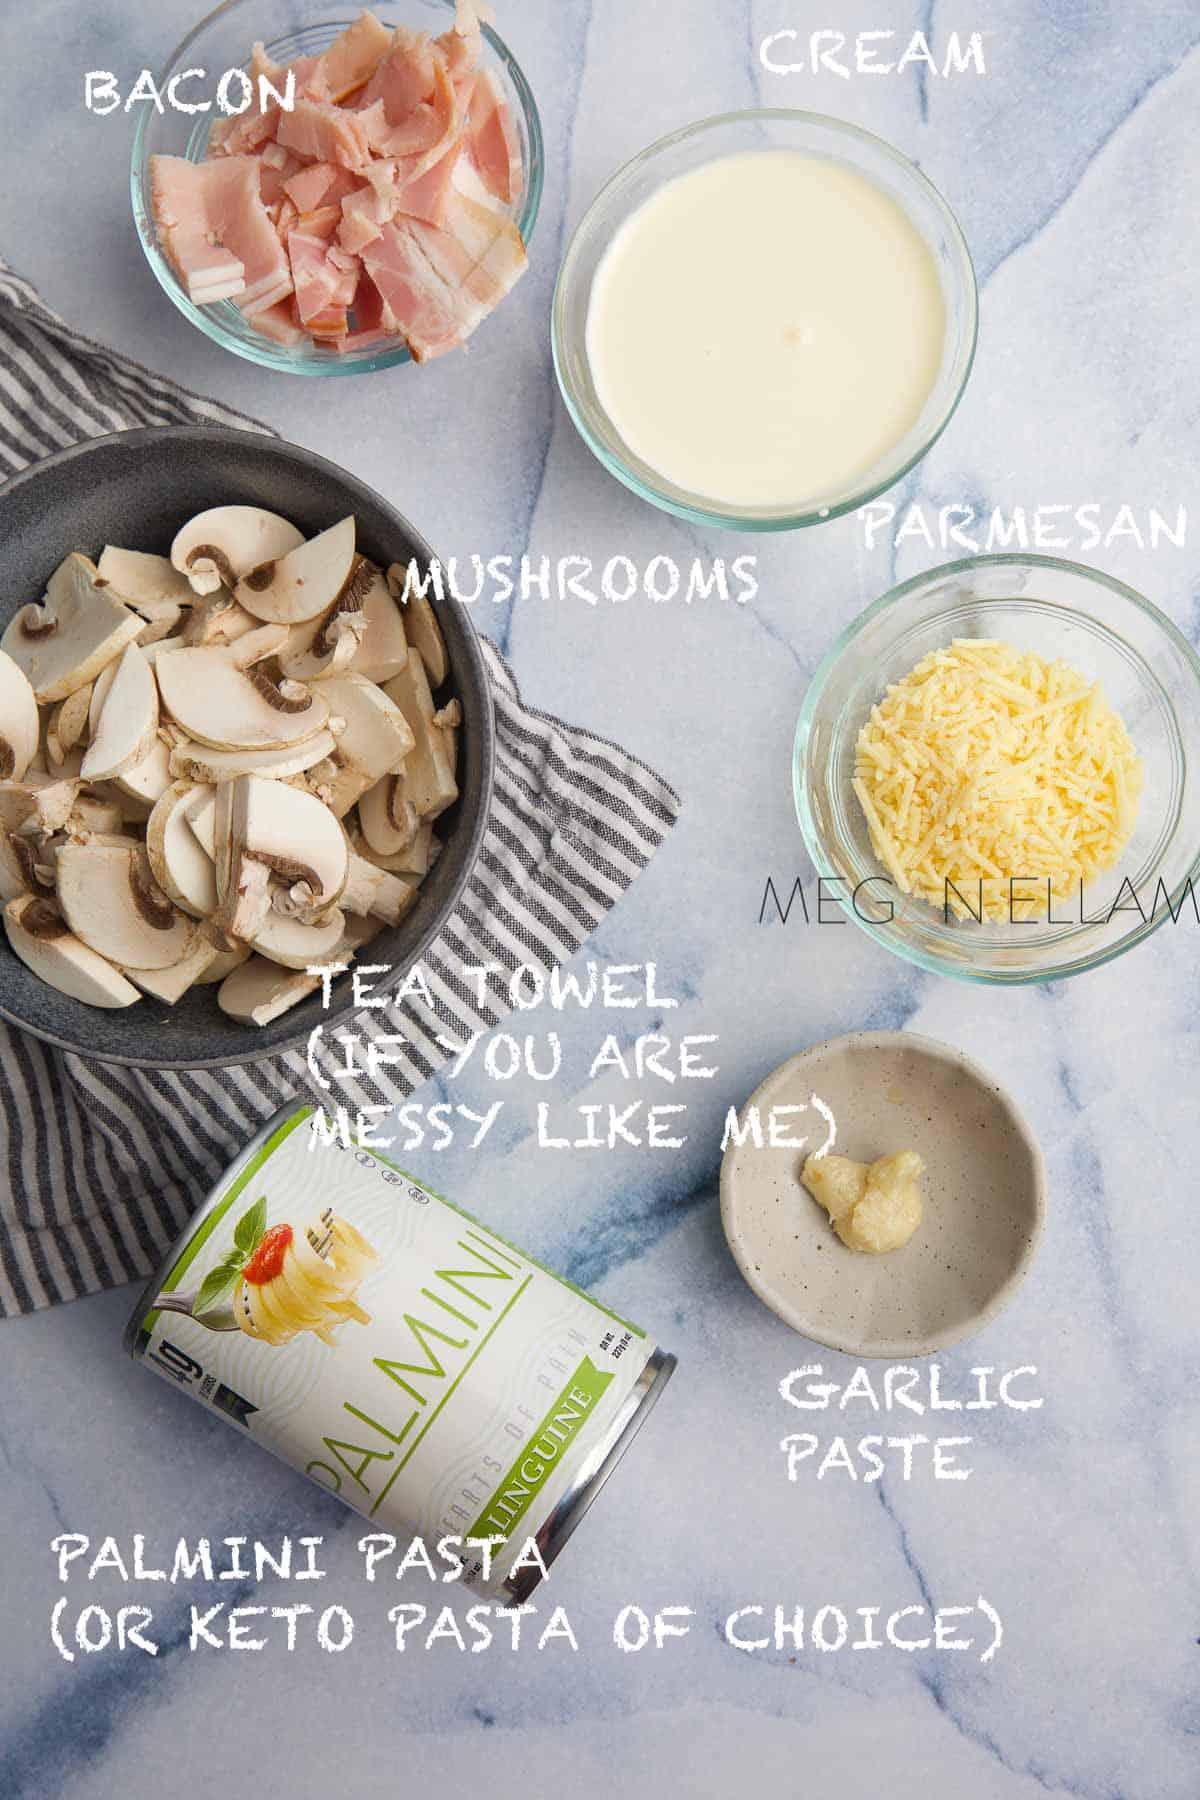 Keto Palmini pasta recipe ingredients in small bowls.